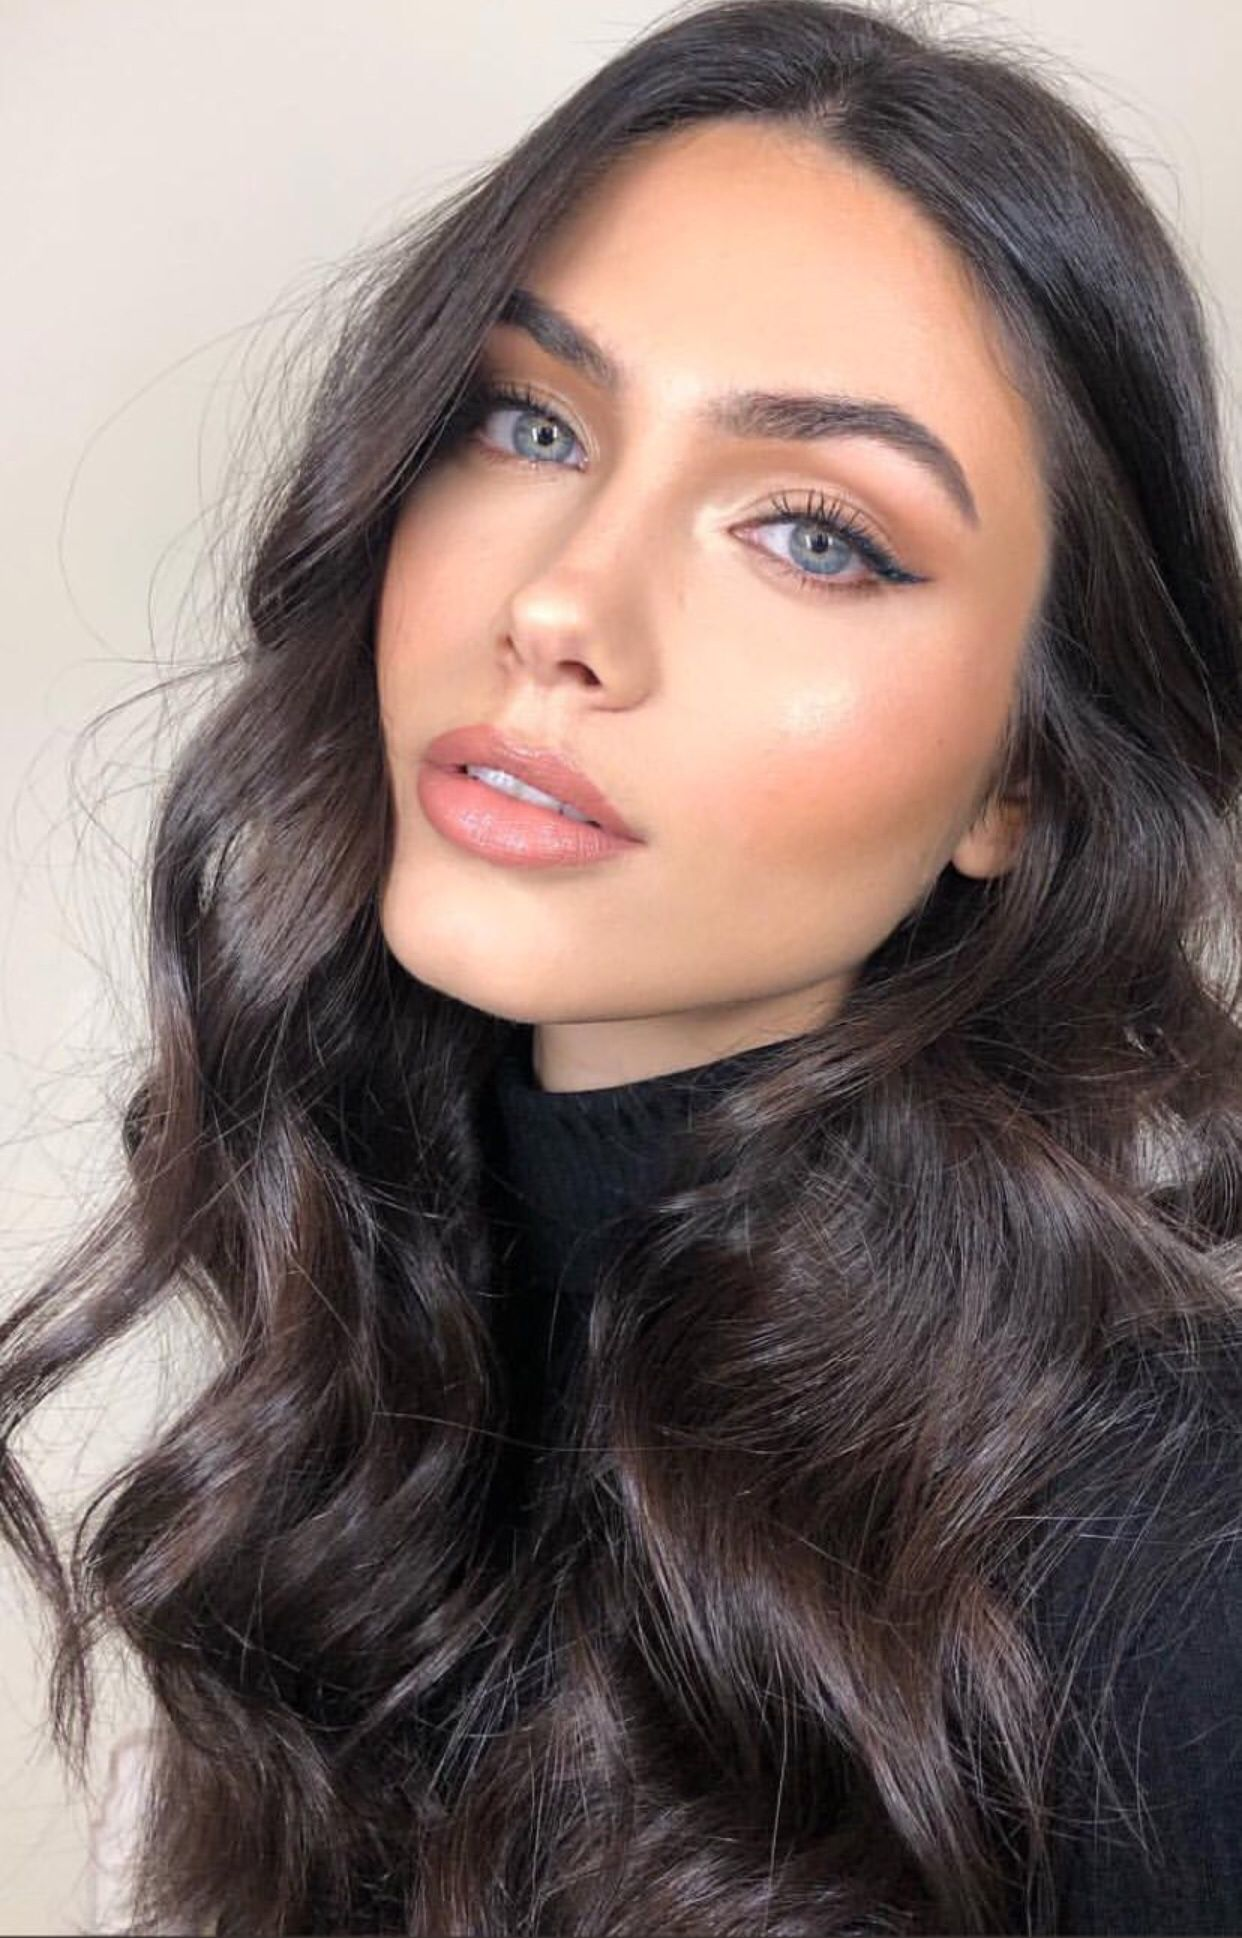 Pin By Salwa Salsabilla On Makeup Goals Dark Hair Blue Eyes Hair Colors For Blue Eyes Hair Makeup